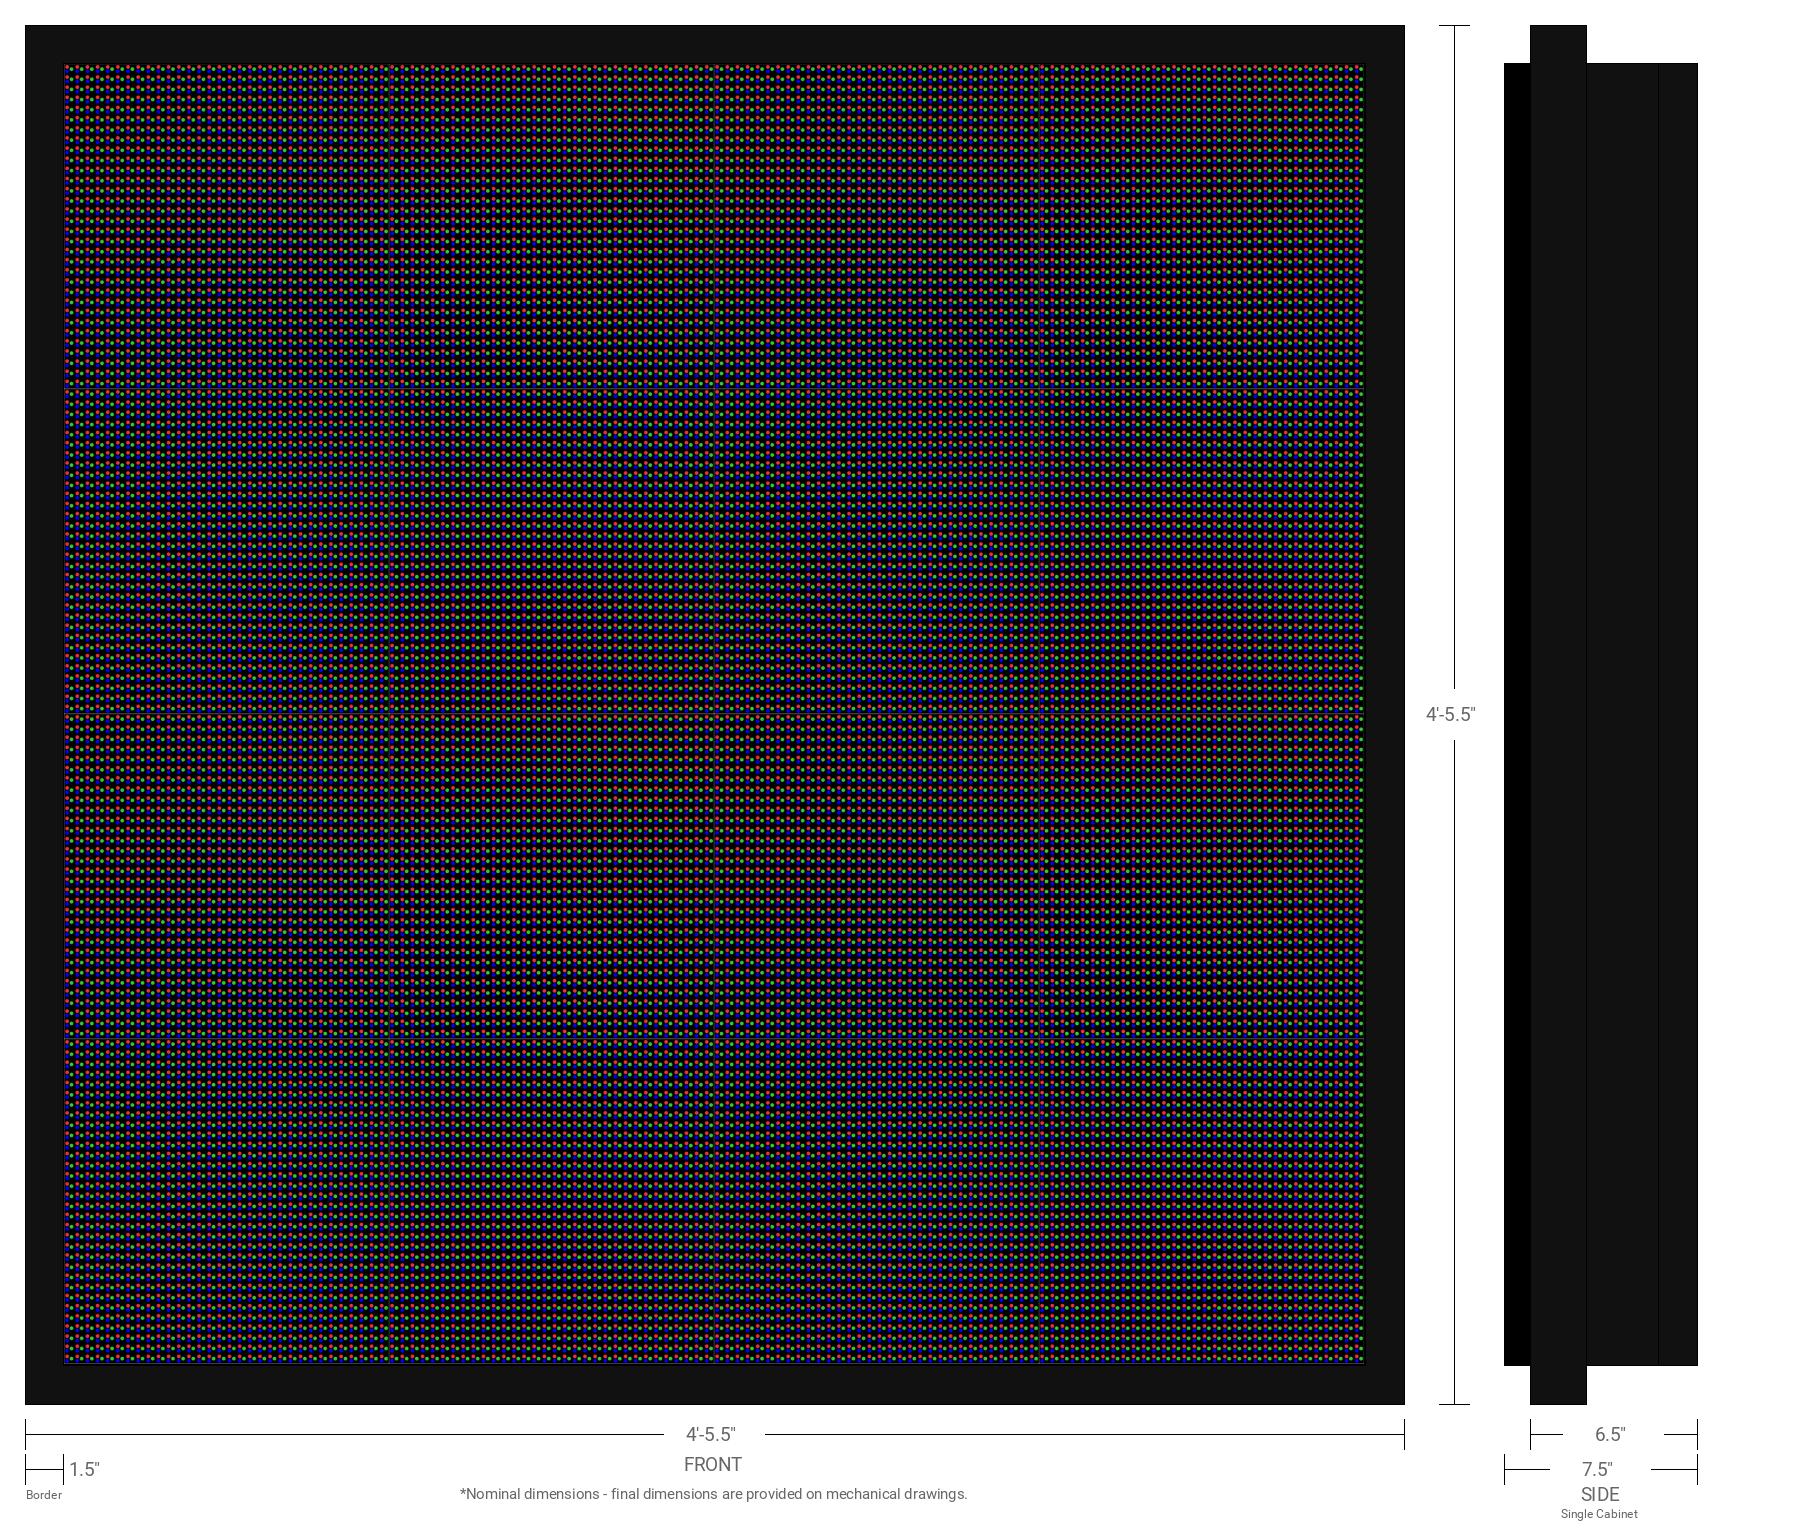 Aurora 10mm 128x128 Single Sided Full Color LED Display